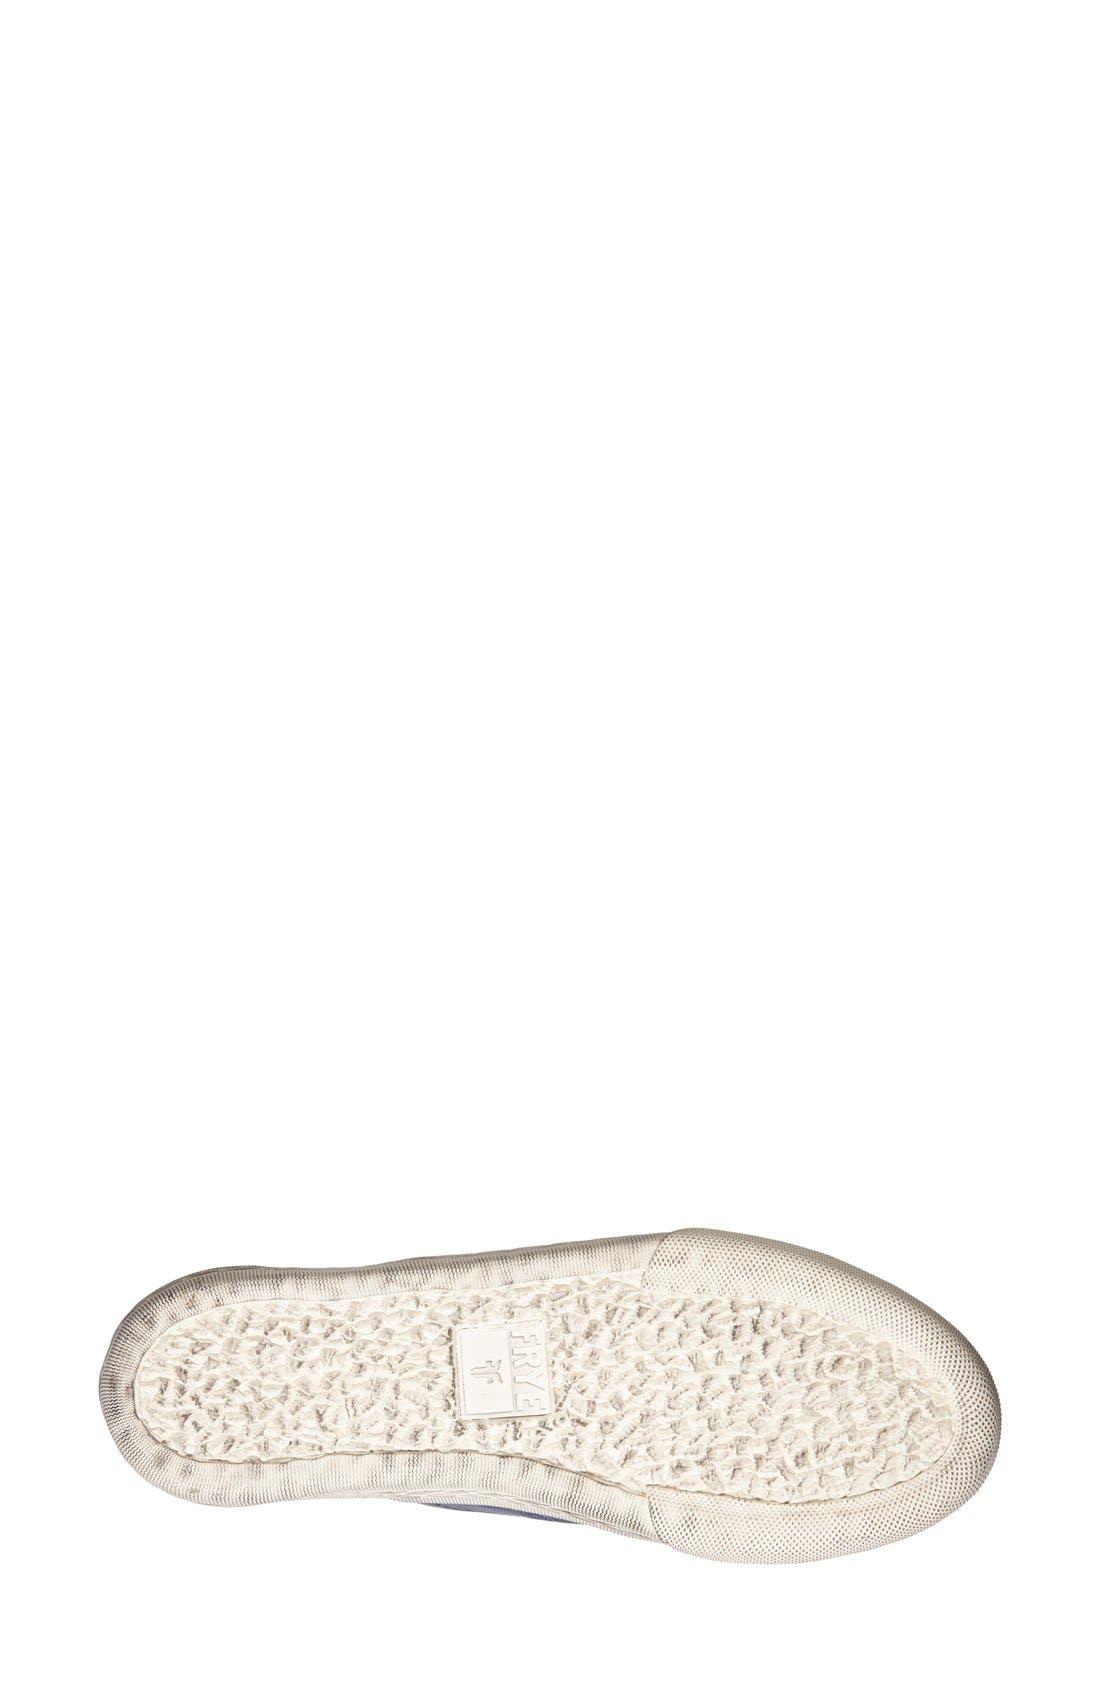 Alternate Image 3  - Frye 'Mindy' Slip-On Leather Sneaker (Women)